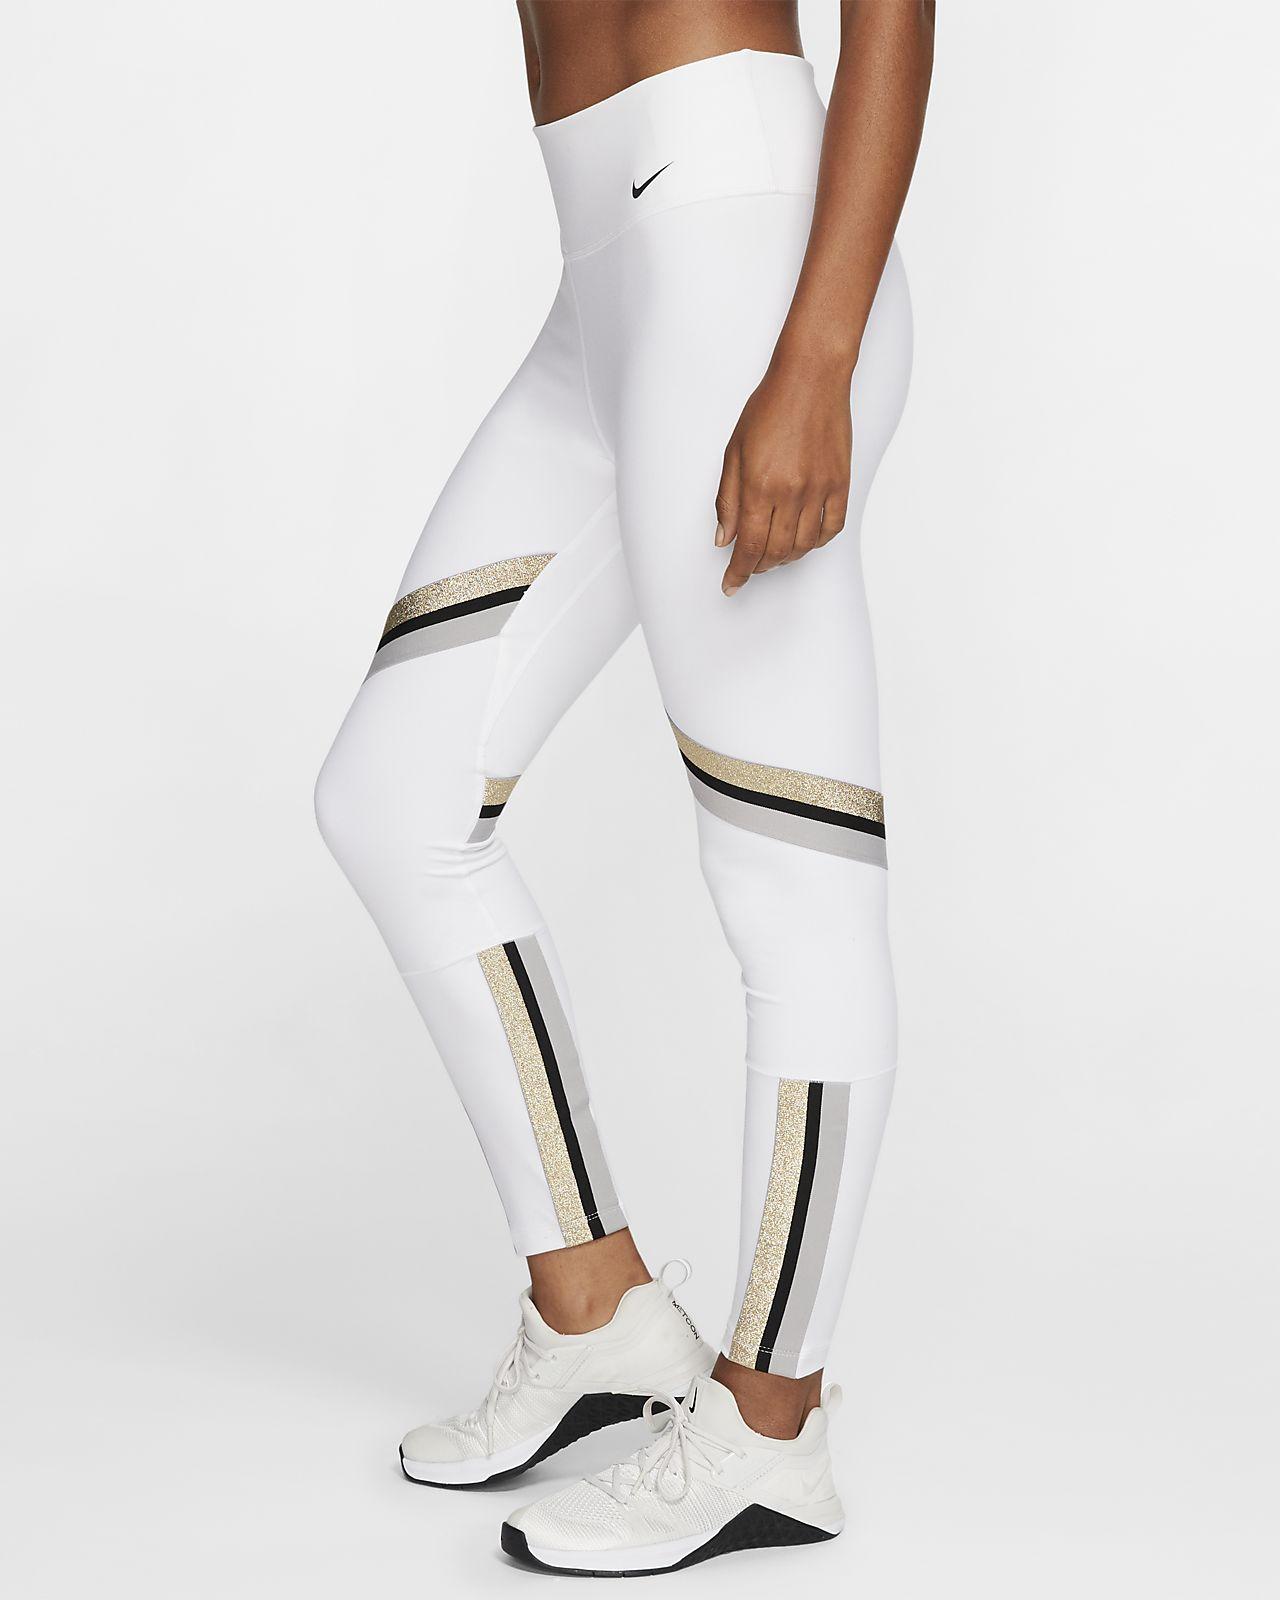 women's 7/8 leggings nike one